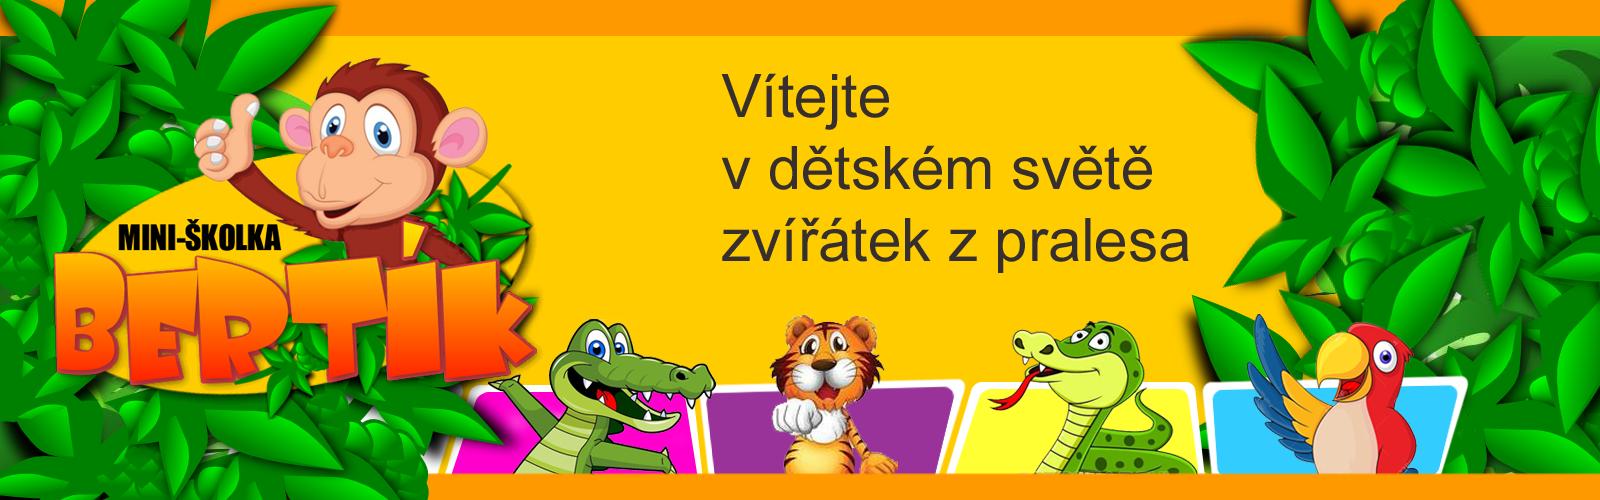 Mini-školka BERTÍK